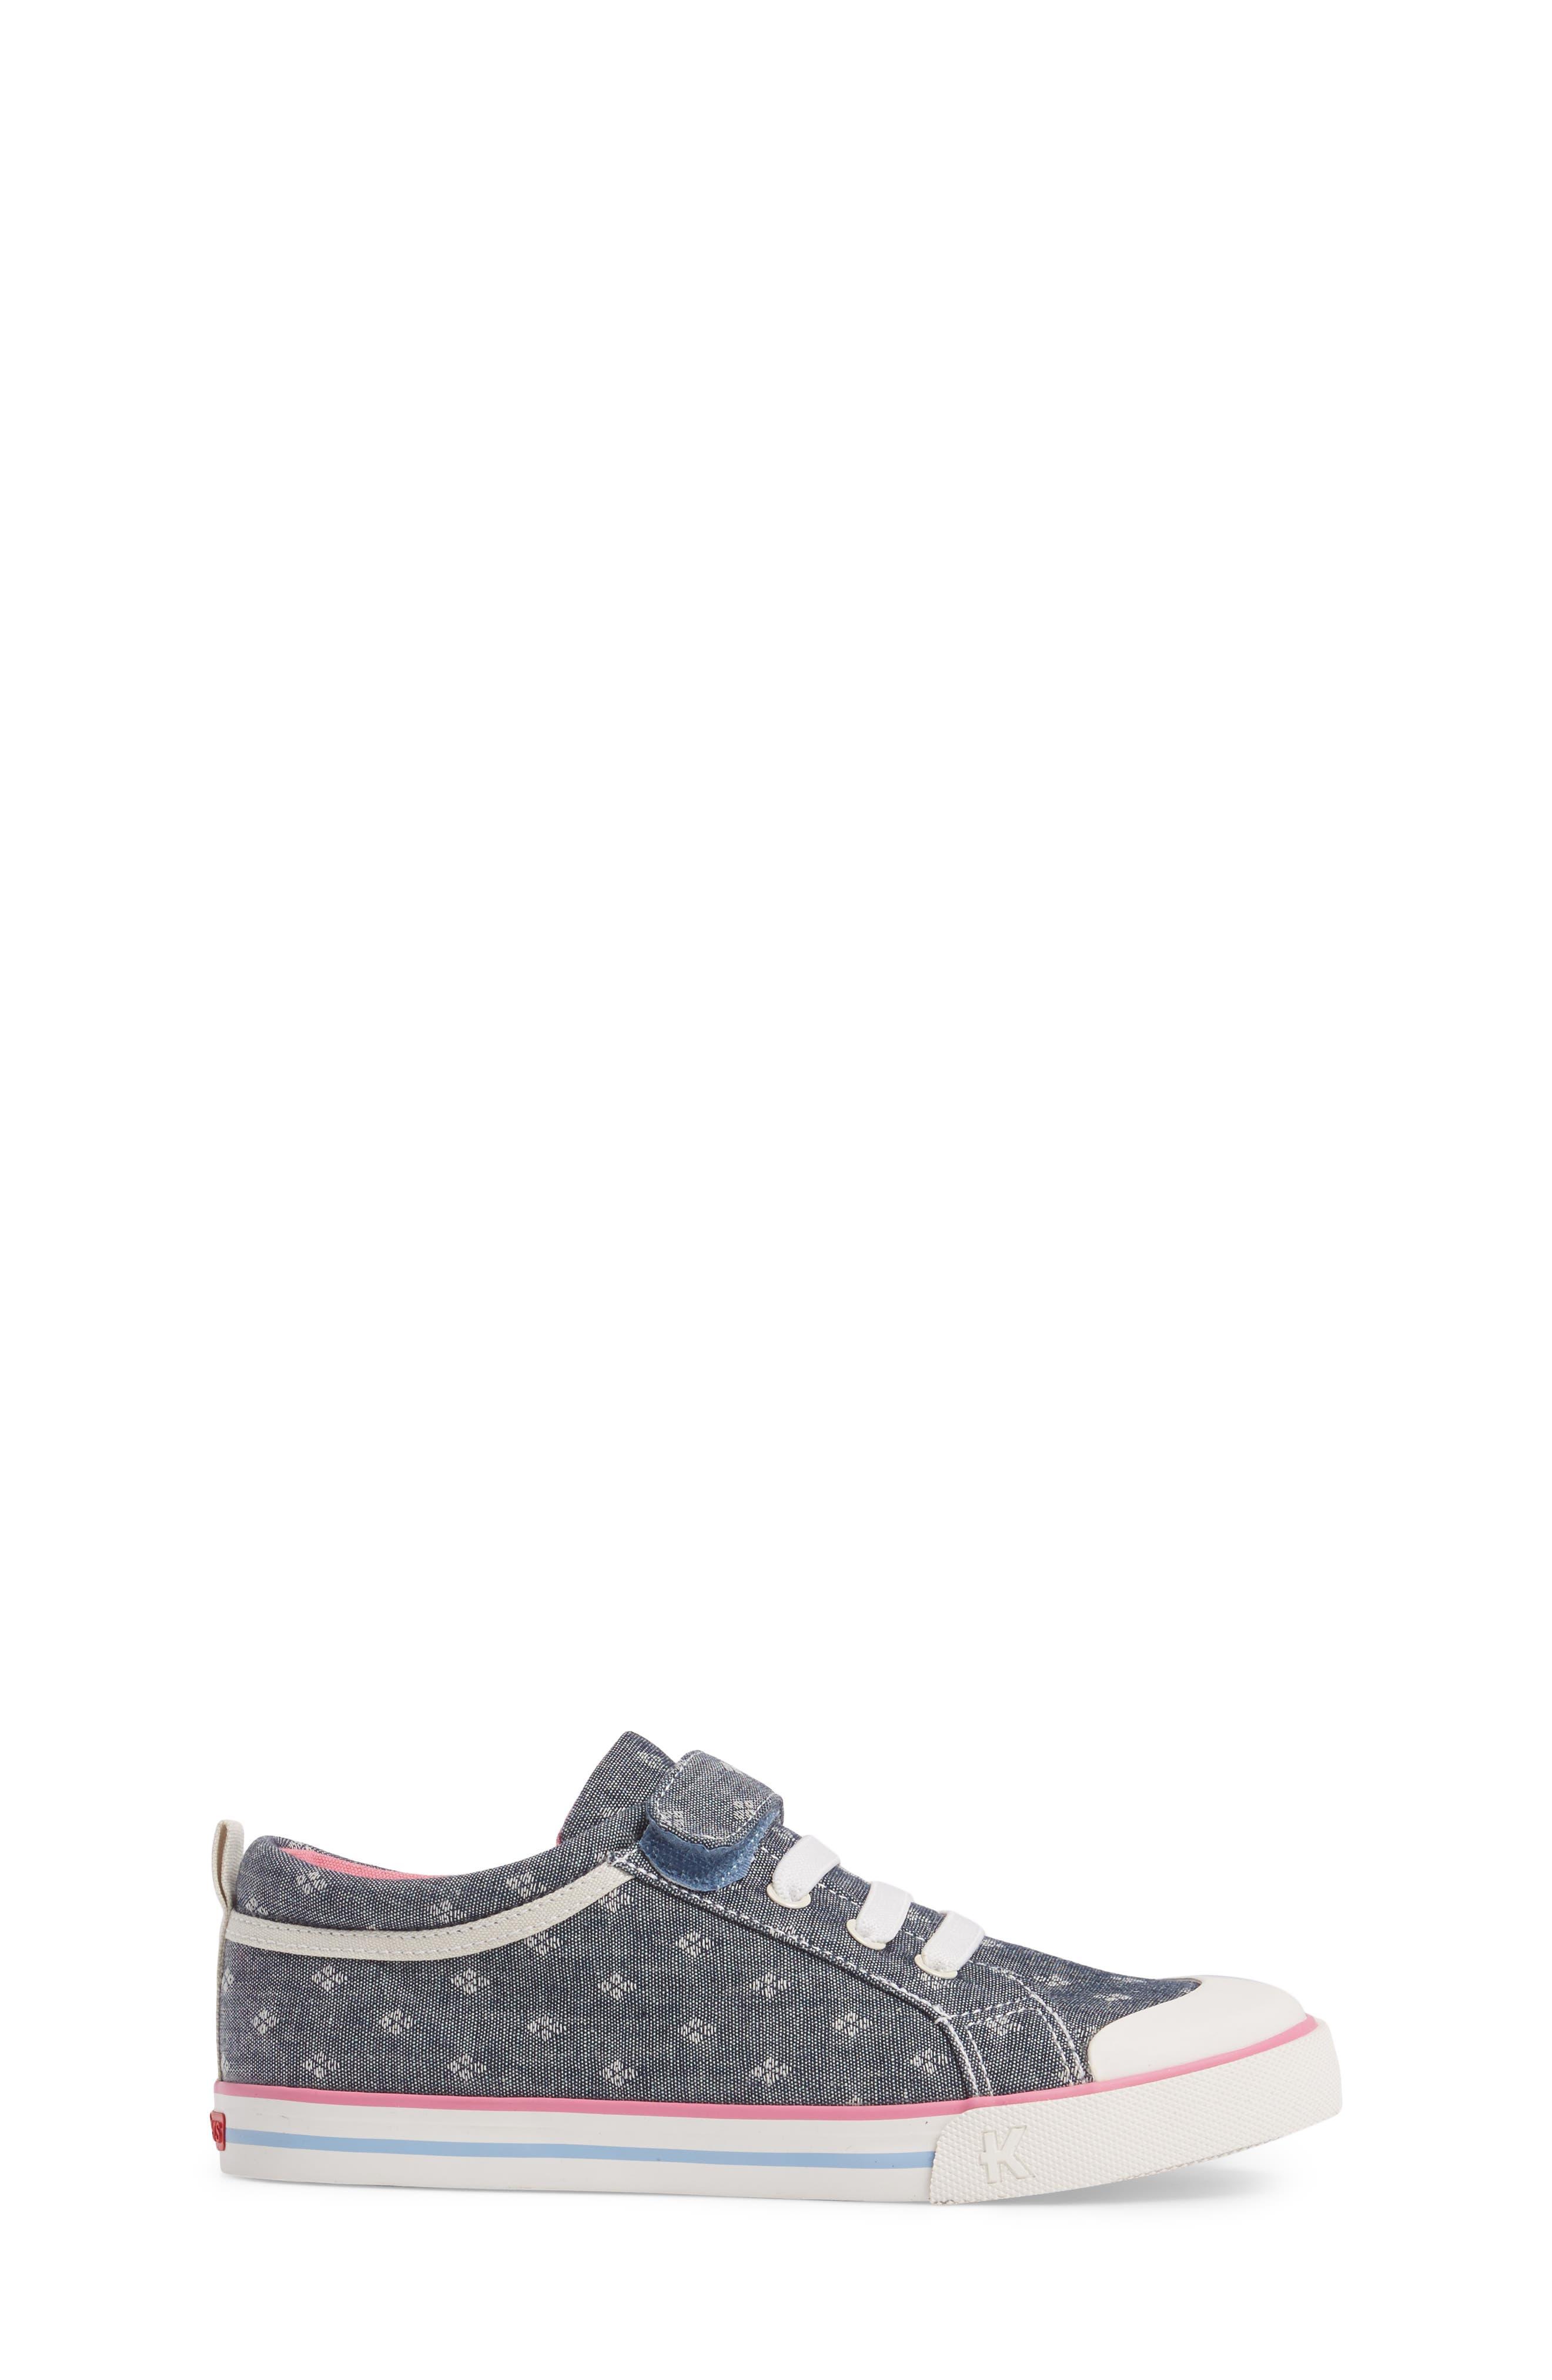 'Kristin' Sneaker,                             Alternate thumbnail 3, color,                             400